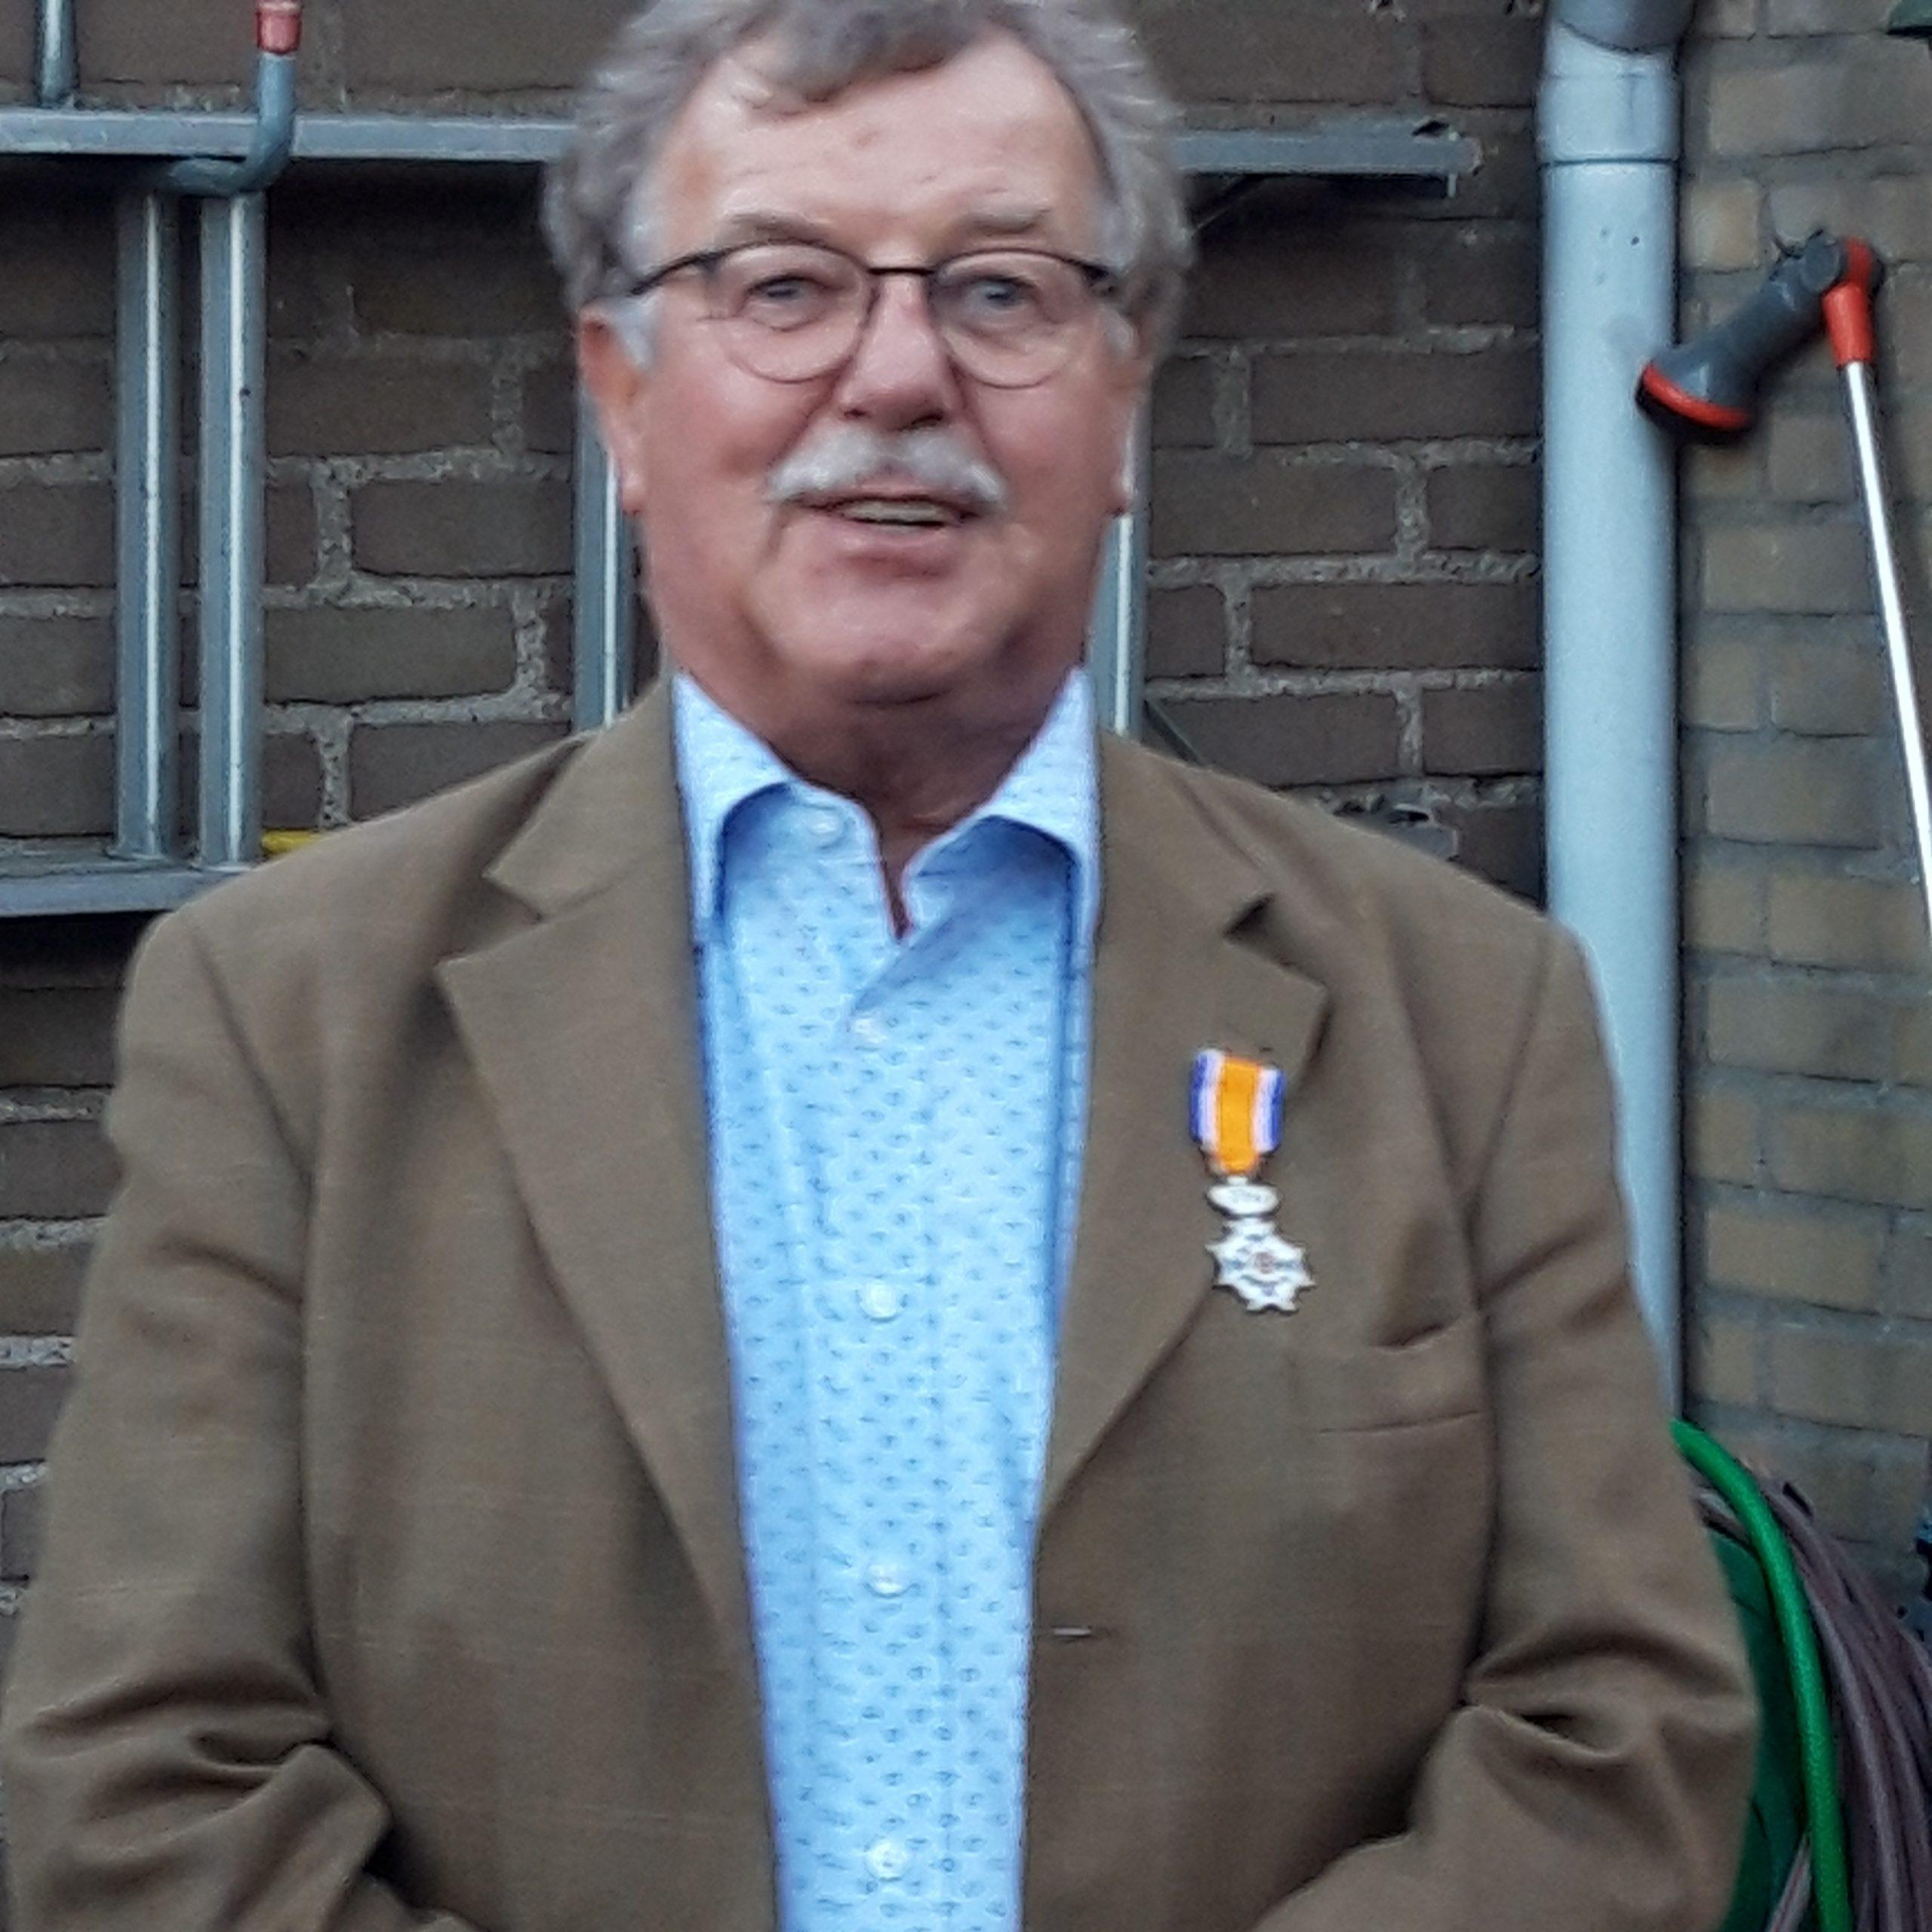 Anne Bruger lid in de Orde van Oranje Nassau.